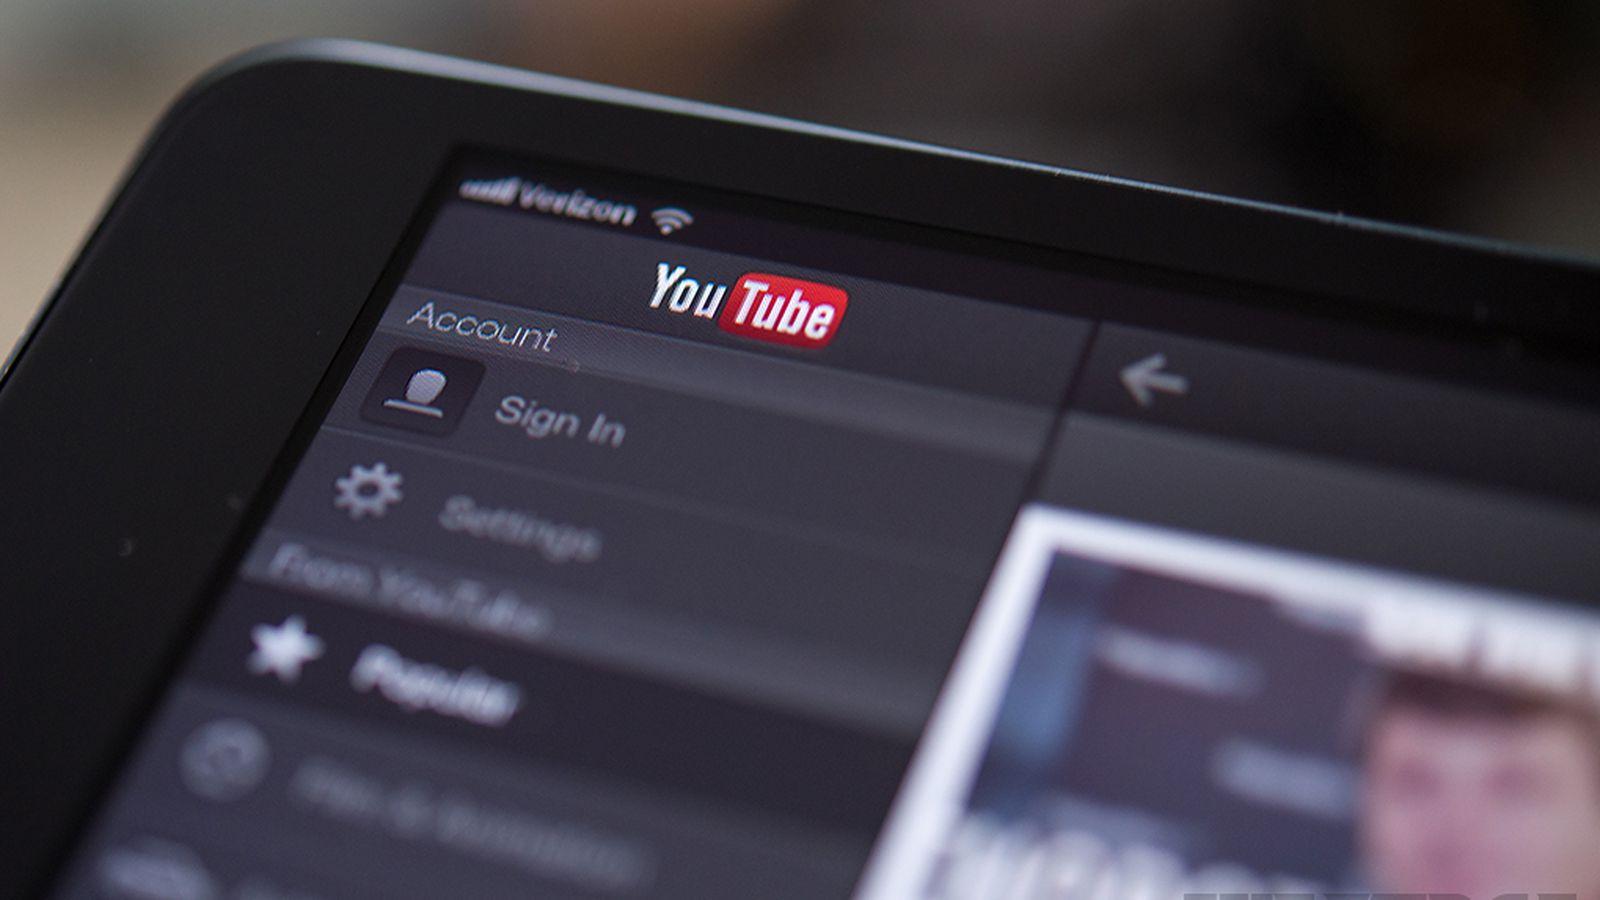 Should YouTube Ban Stunt Videos?